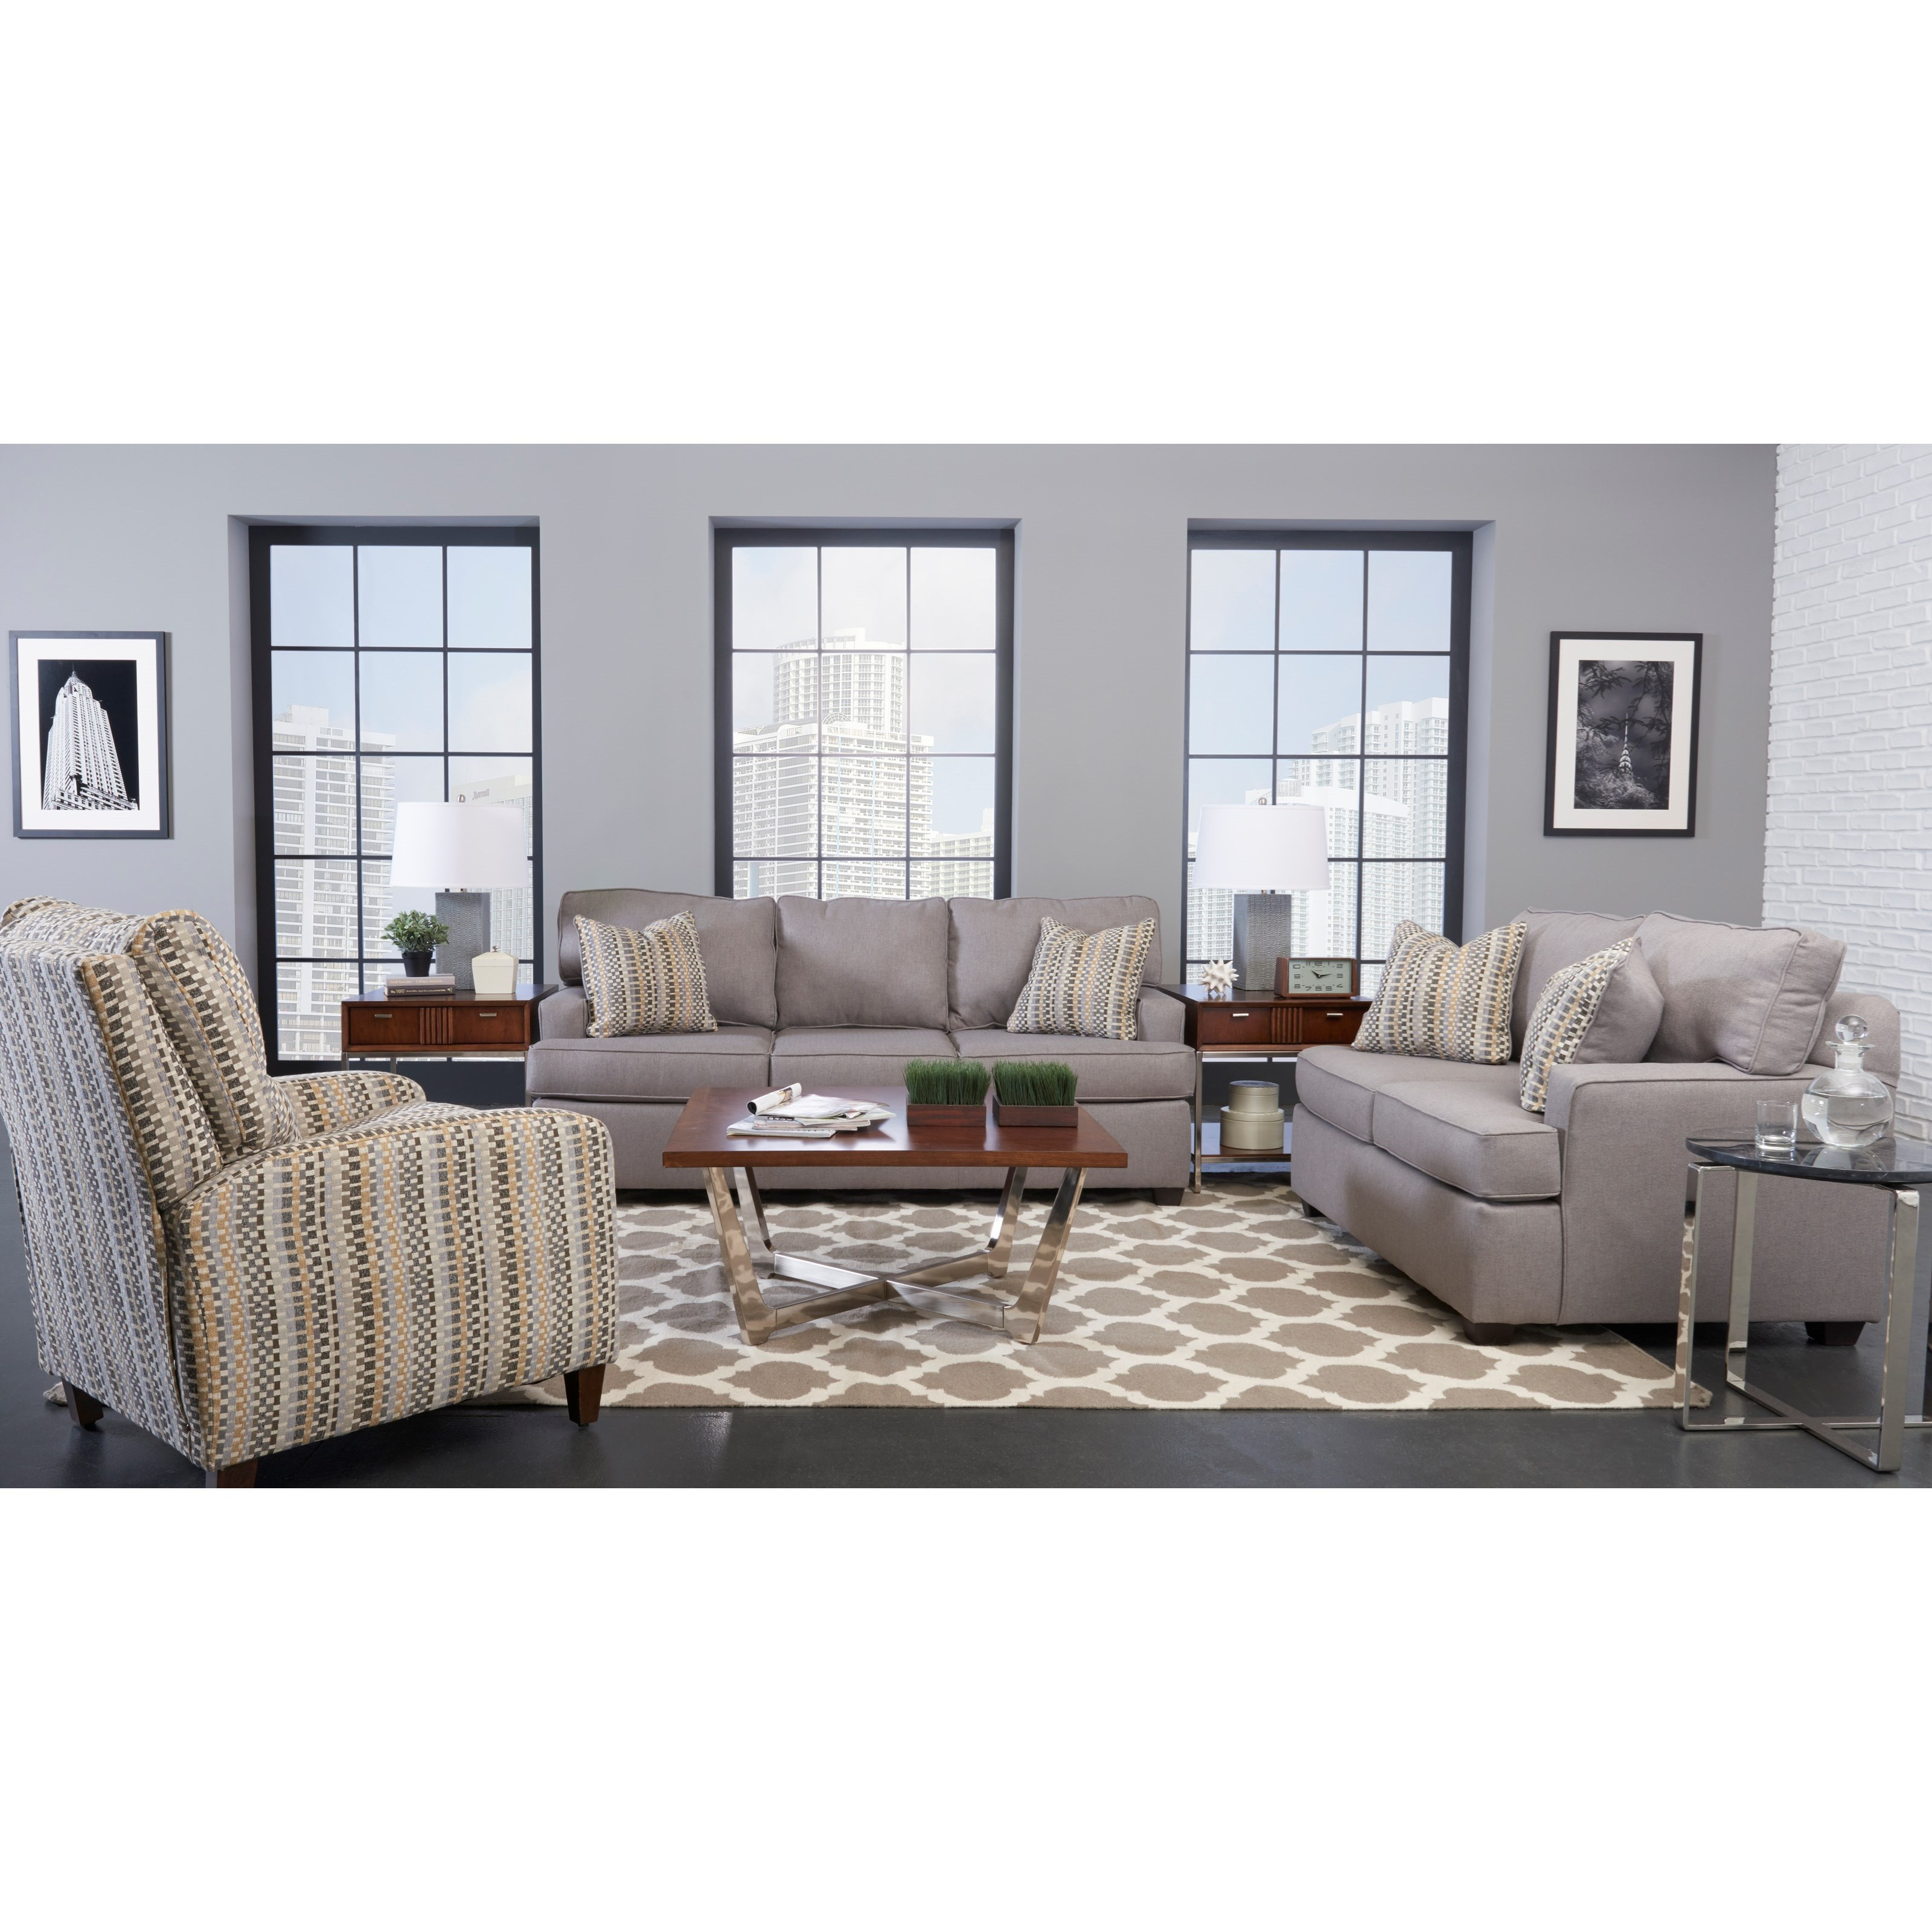 Klaussner cruze living room group wayside furniture for Living room furniture groups